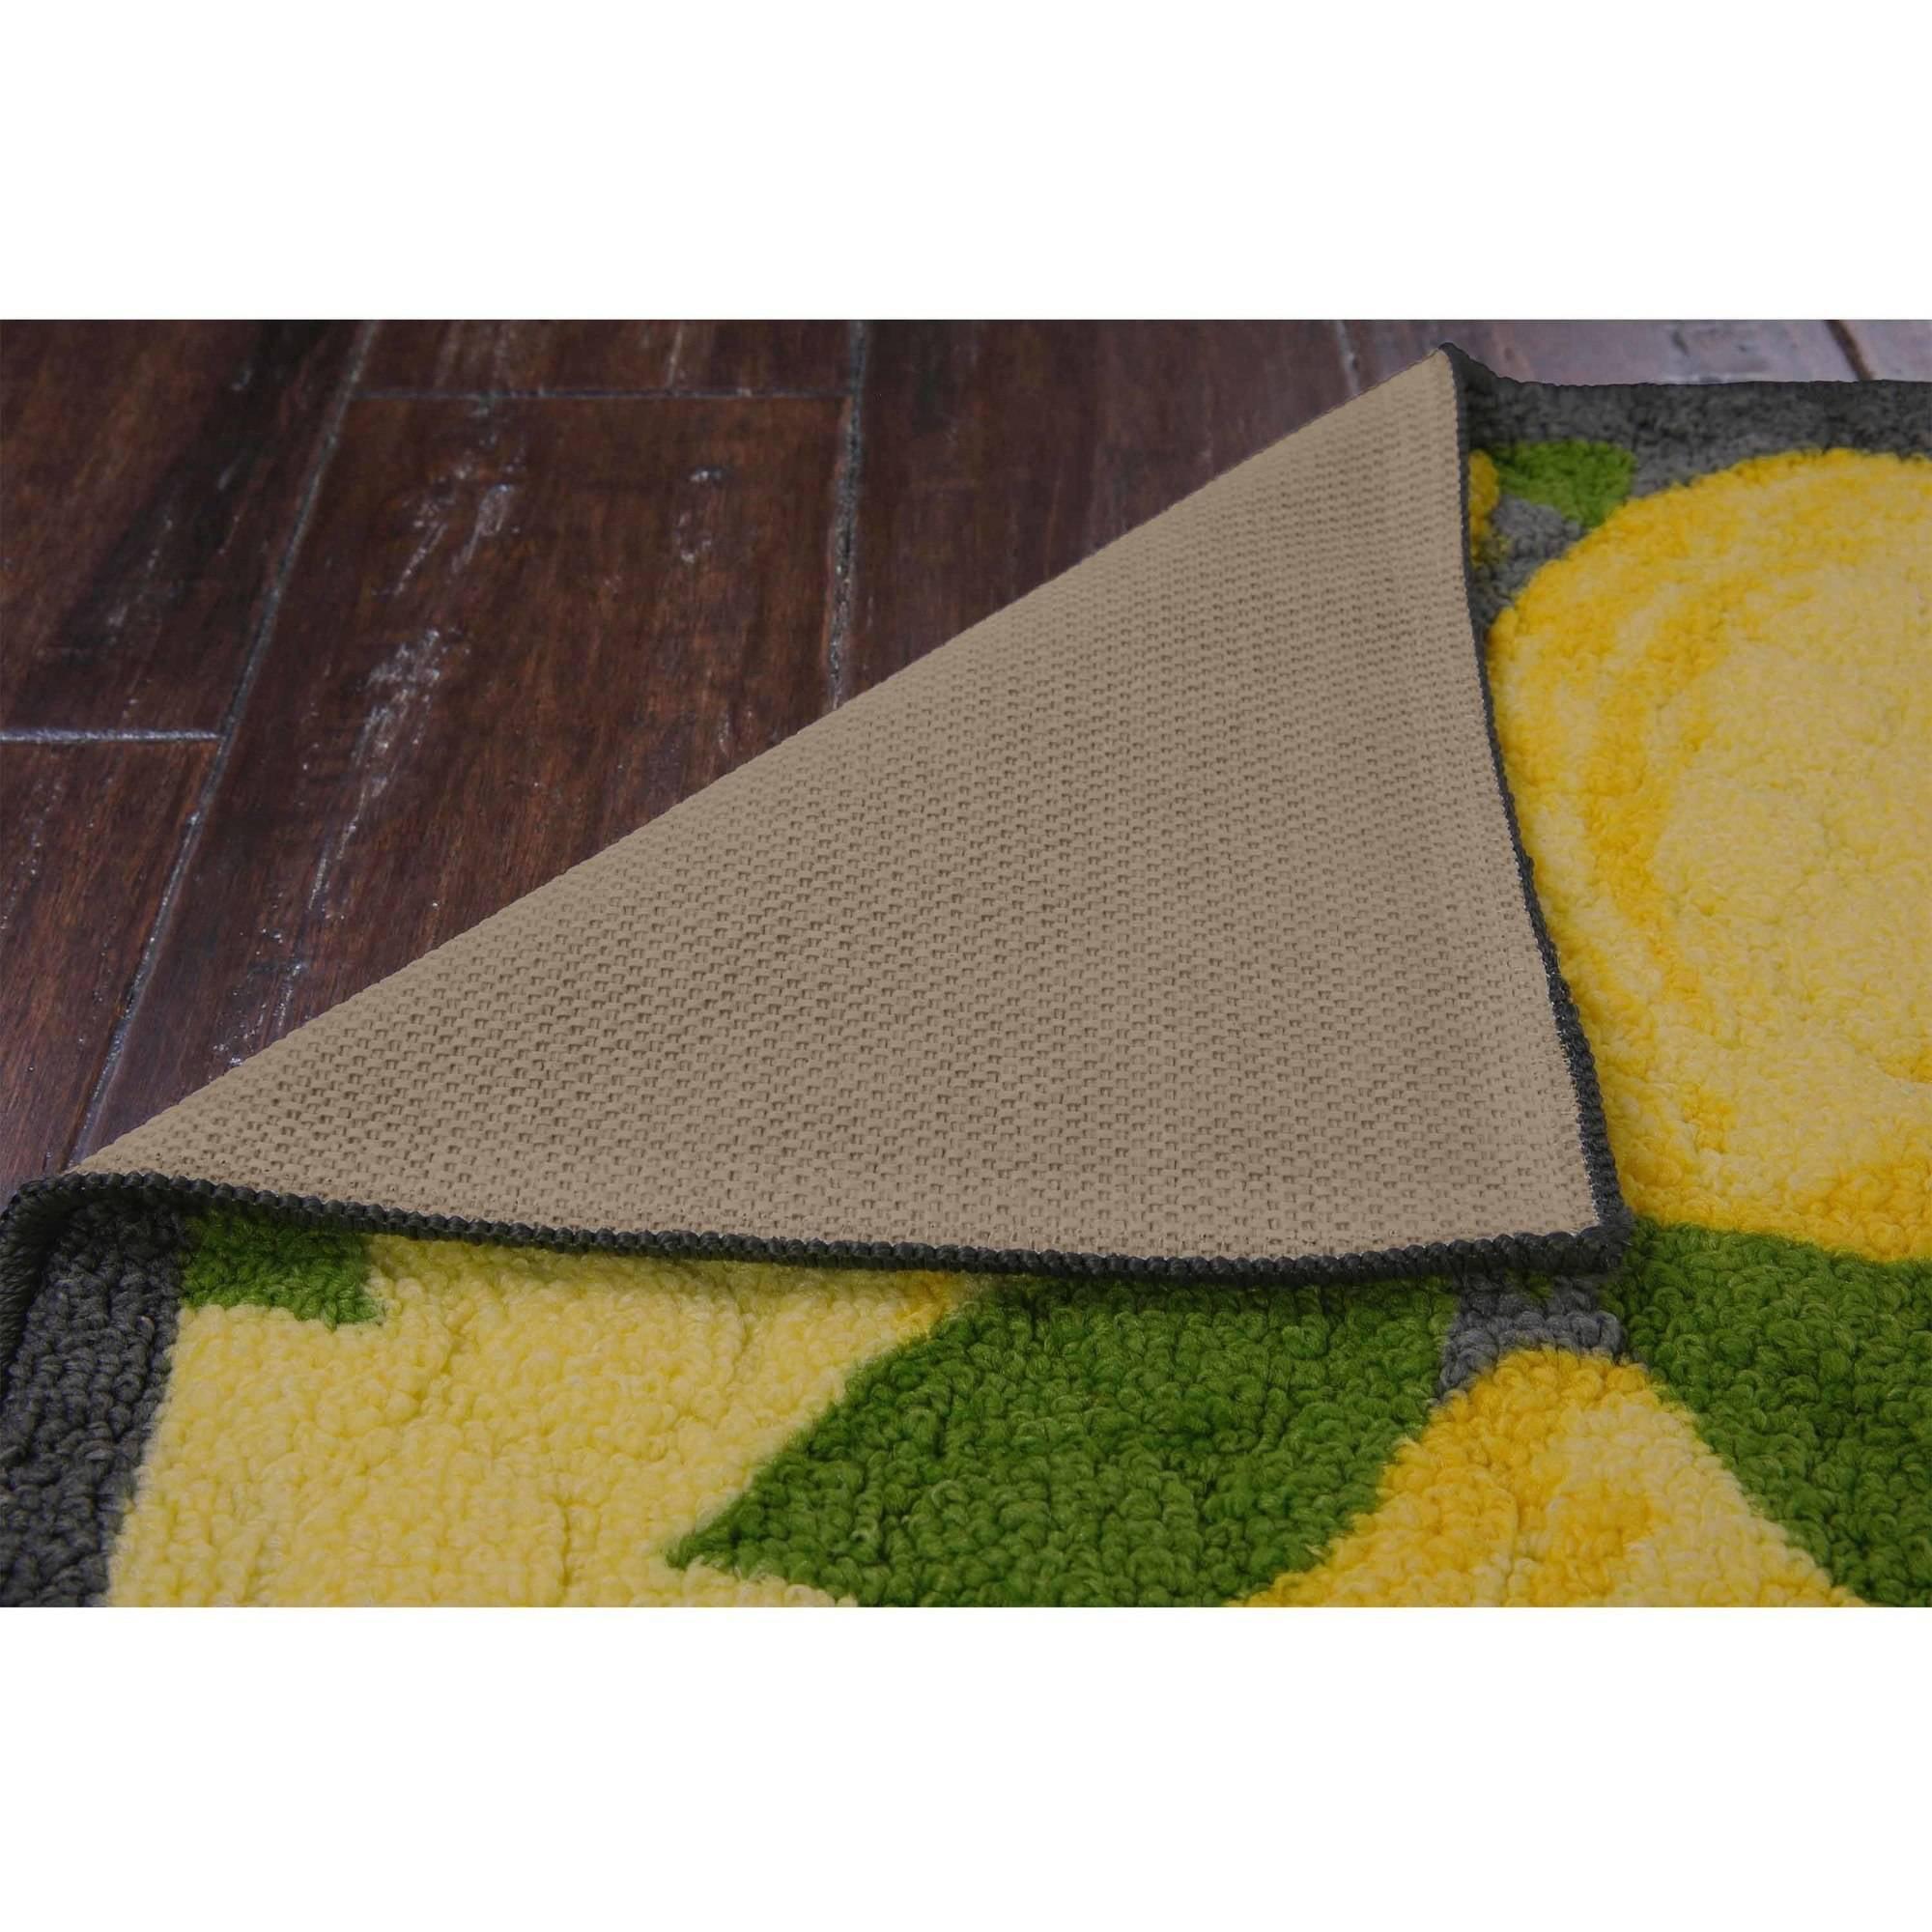 better homes and gardens lemon kitchen rug - best area rugs